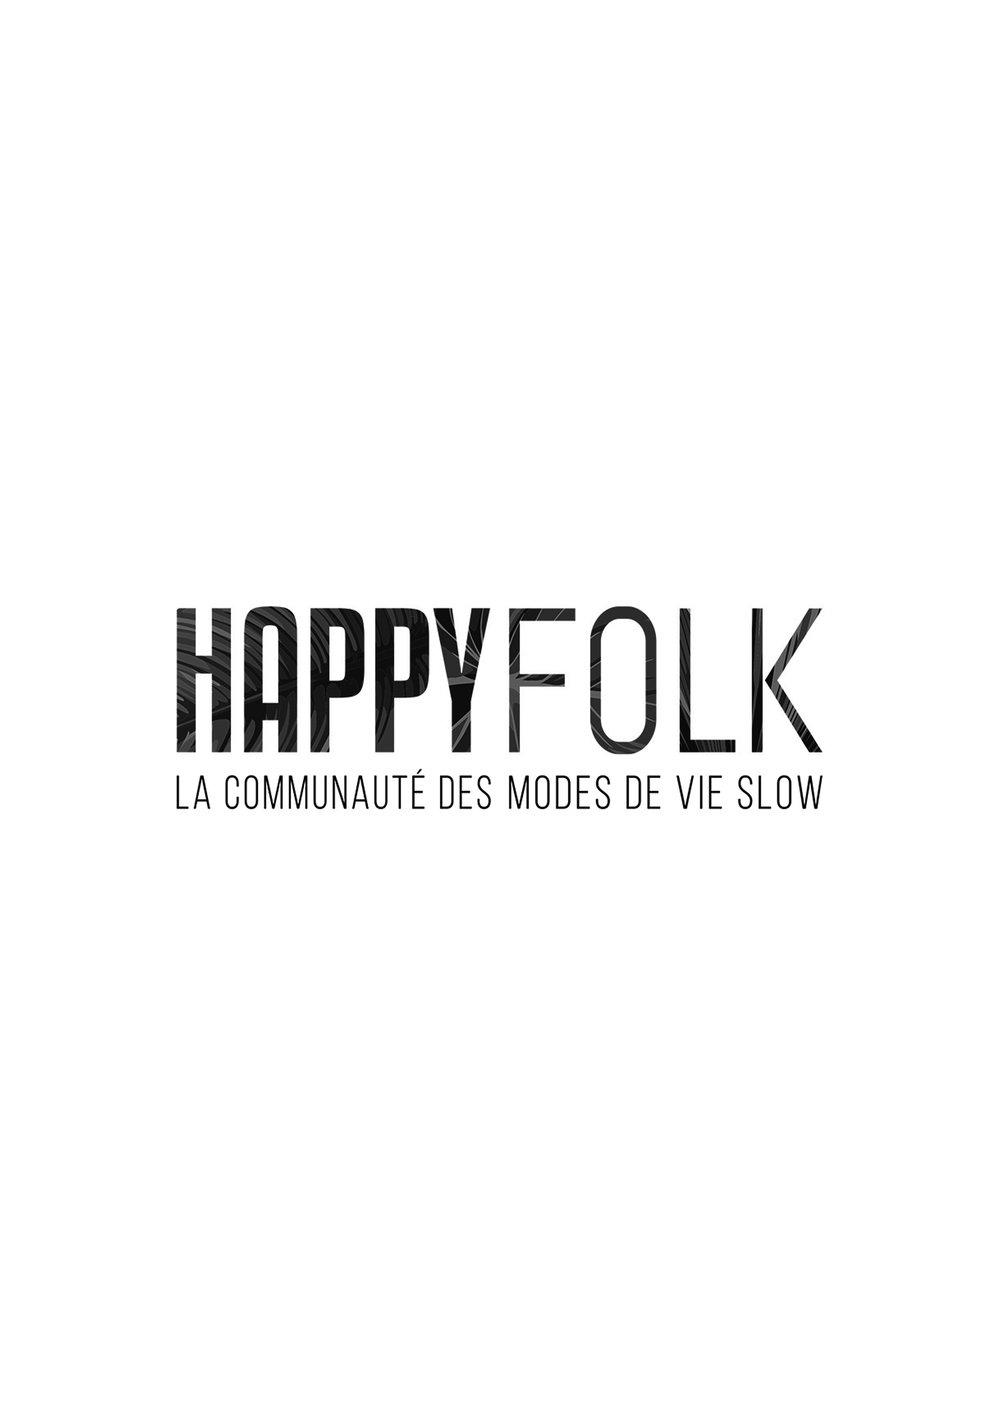 happy folk.jpg